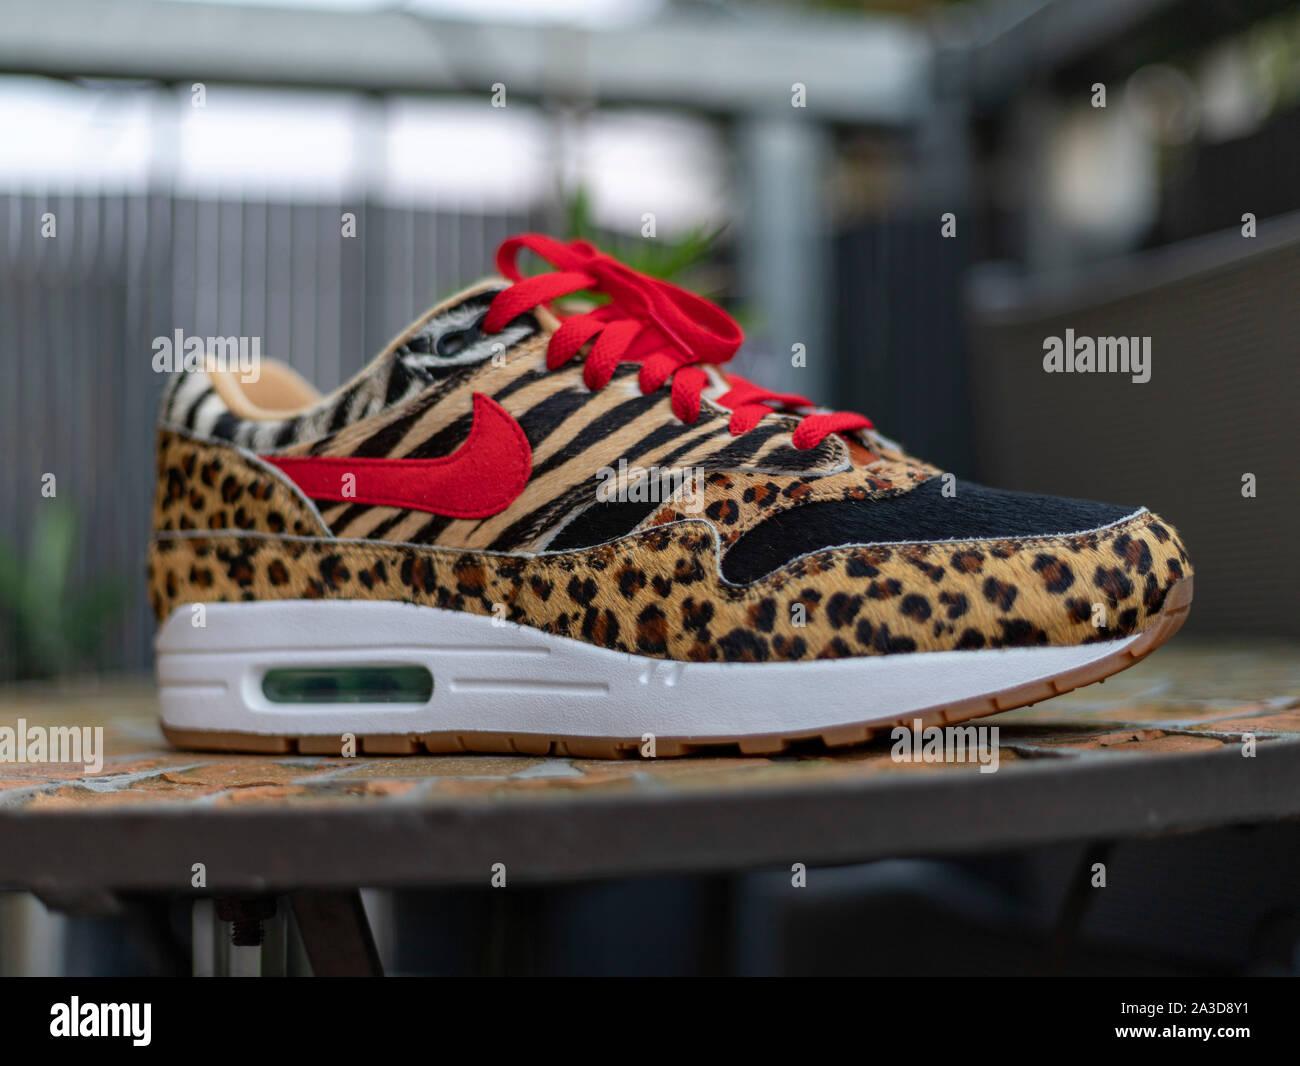 Nike Air Max Stockfotos & Nike Air Max Bilder Alamy